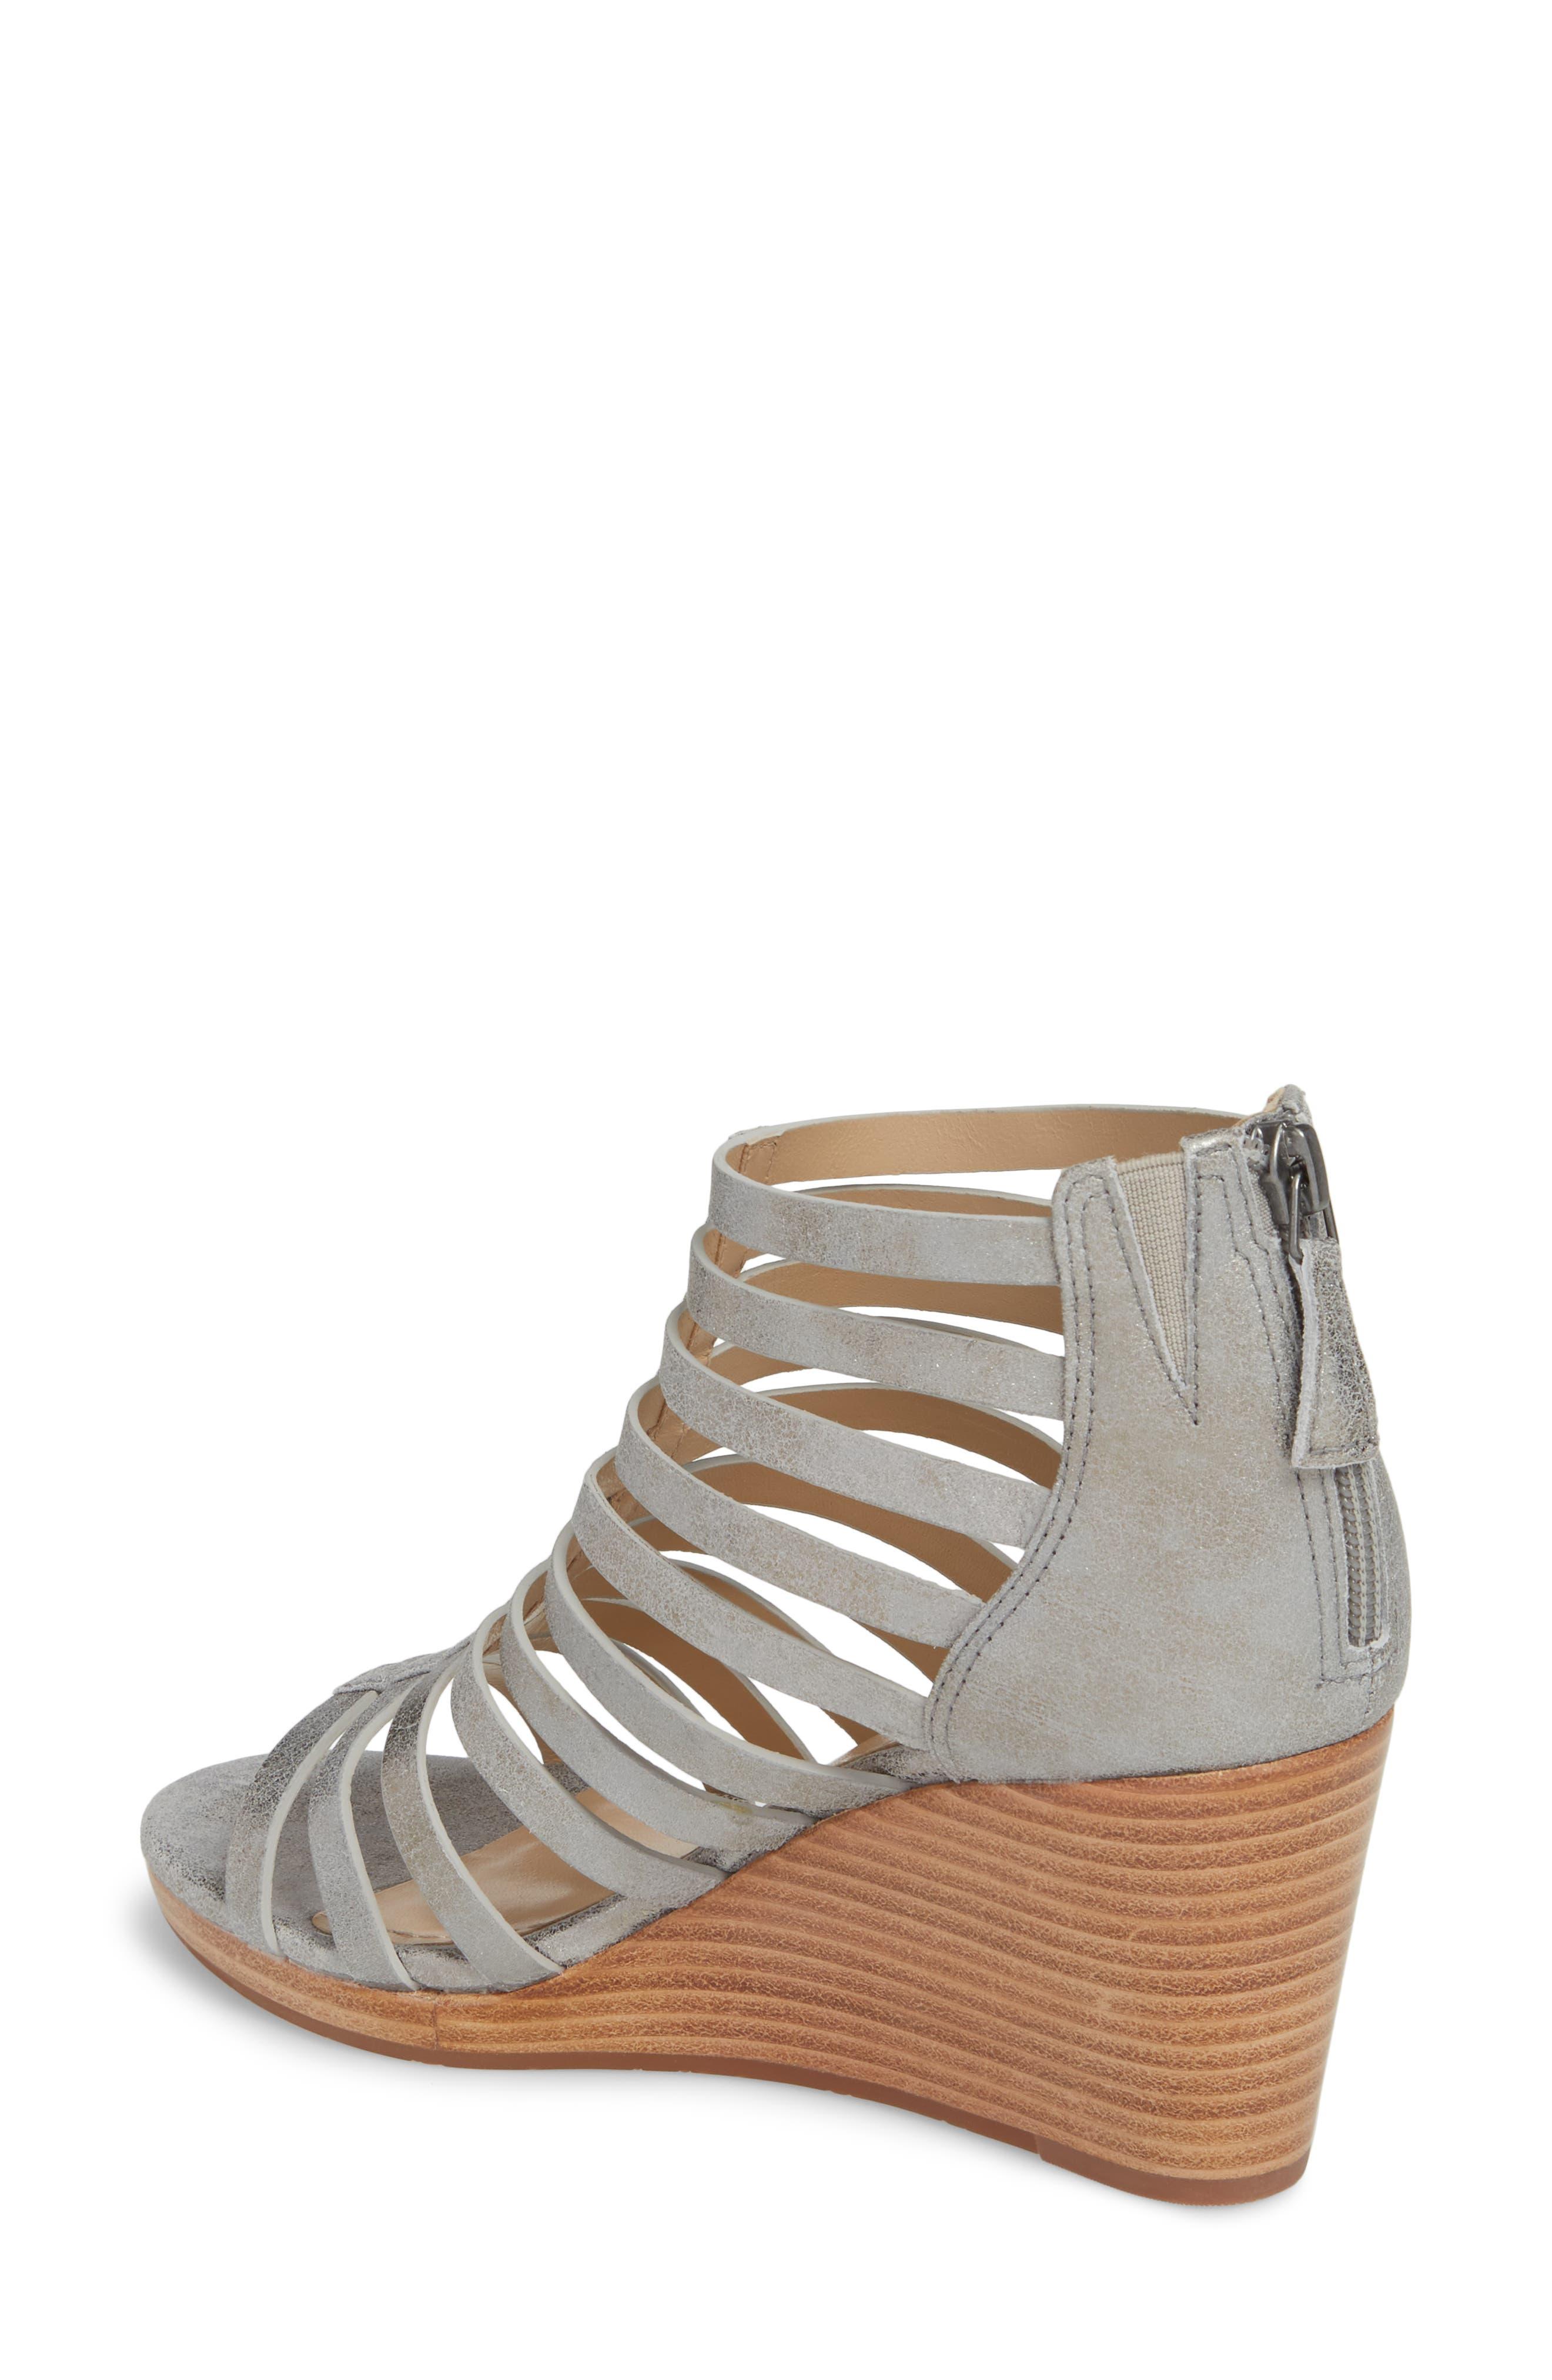 Geneva Strappy Wedge Sandal,                             Alternate thumbnail 3, color,